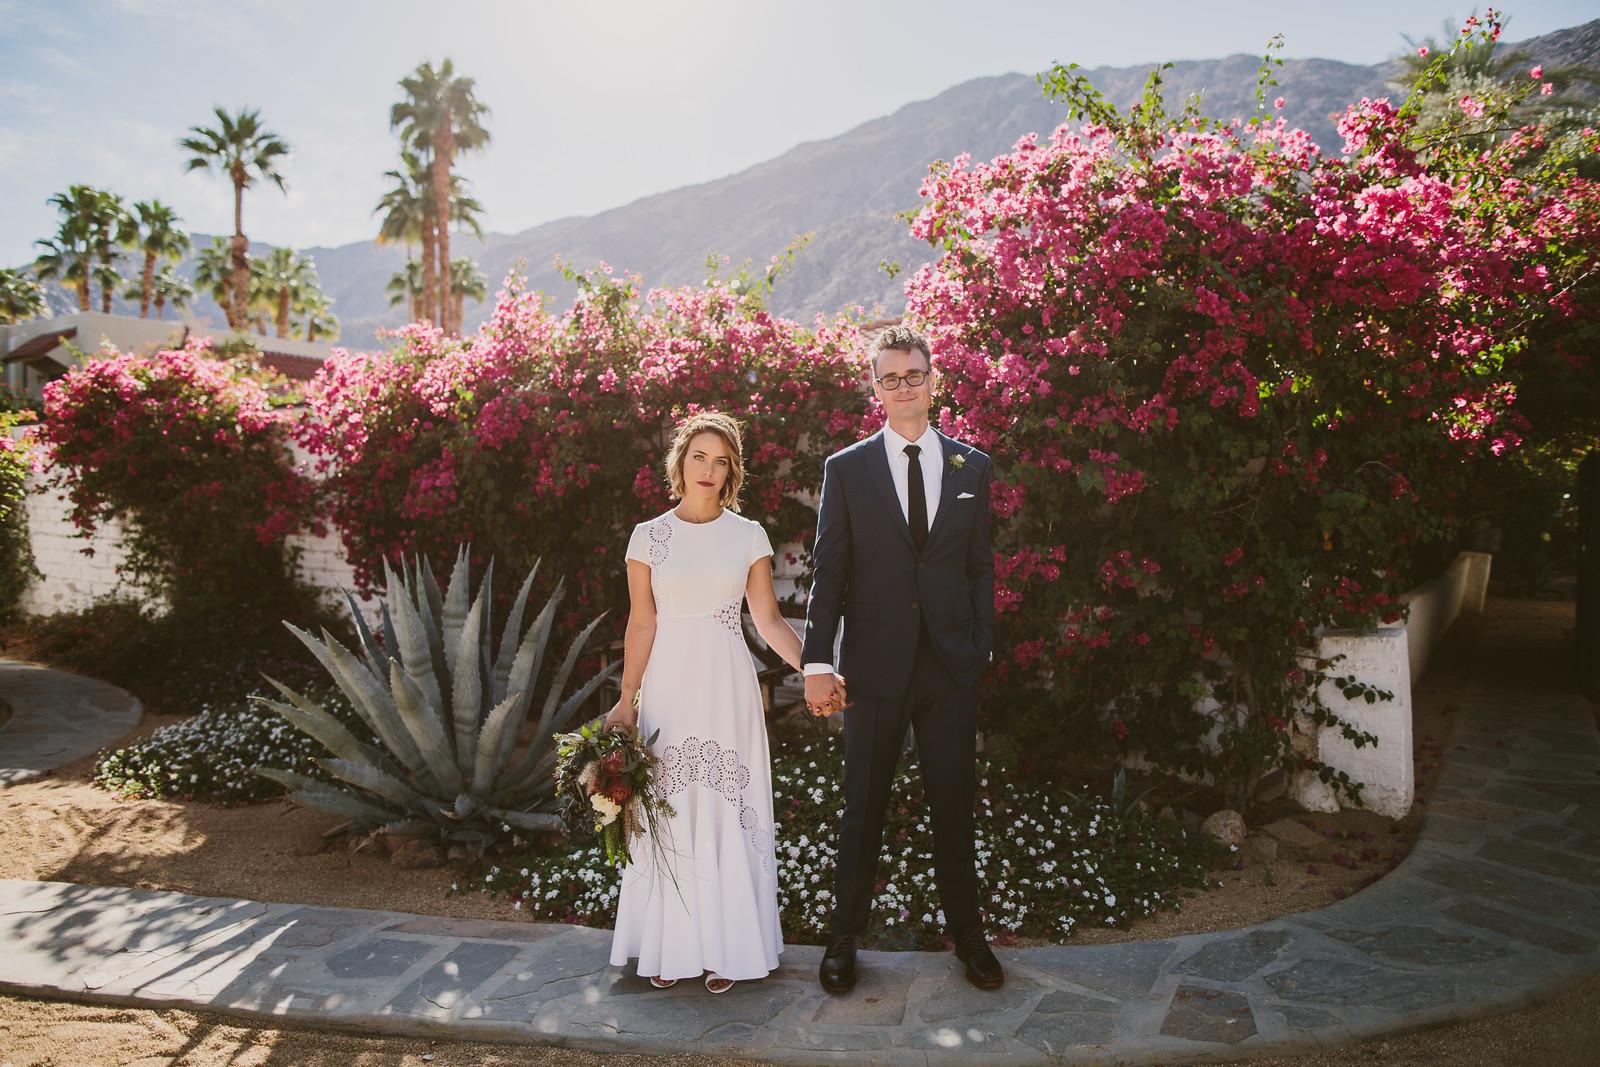 korakia-pensione-Wedding5.jpg